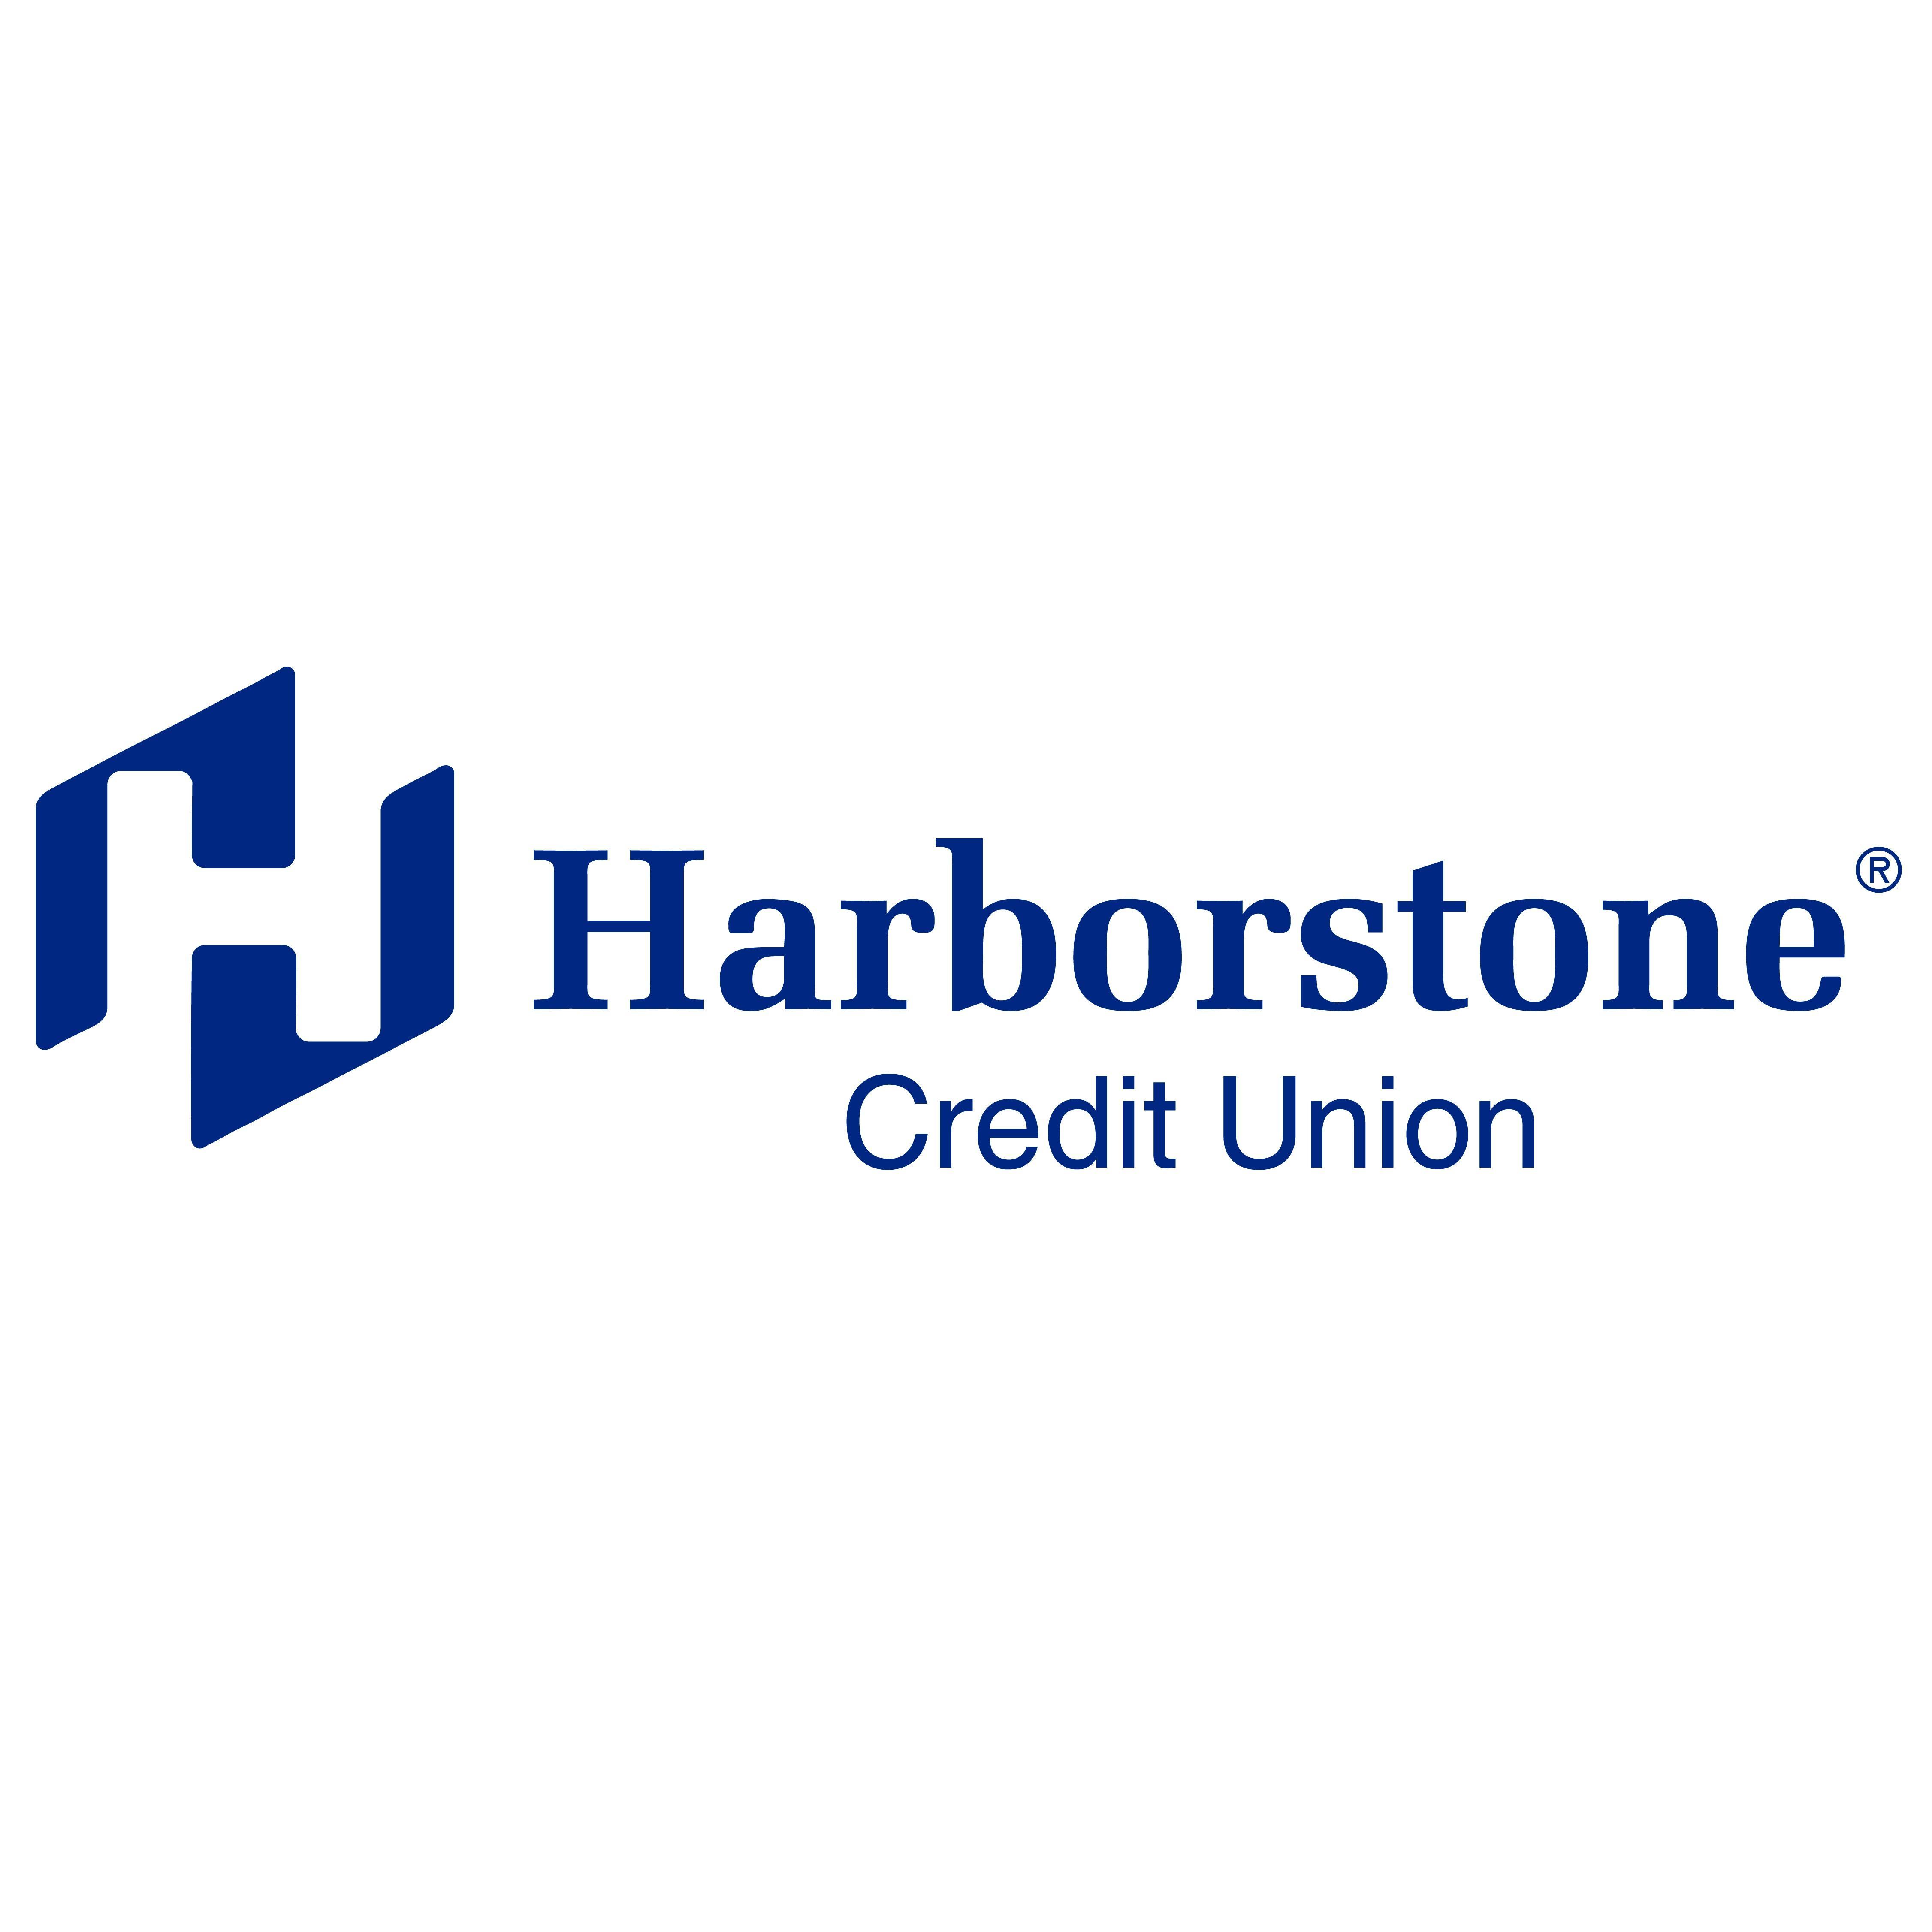 Harborstone Credit Union - Seattle